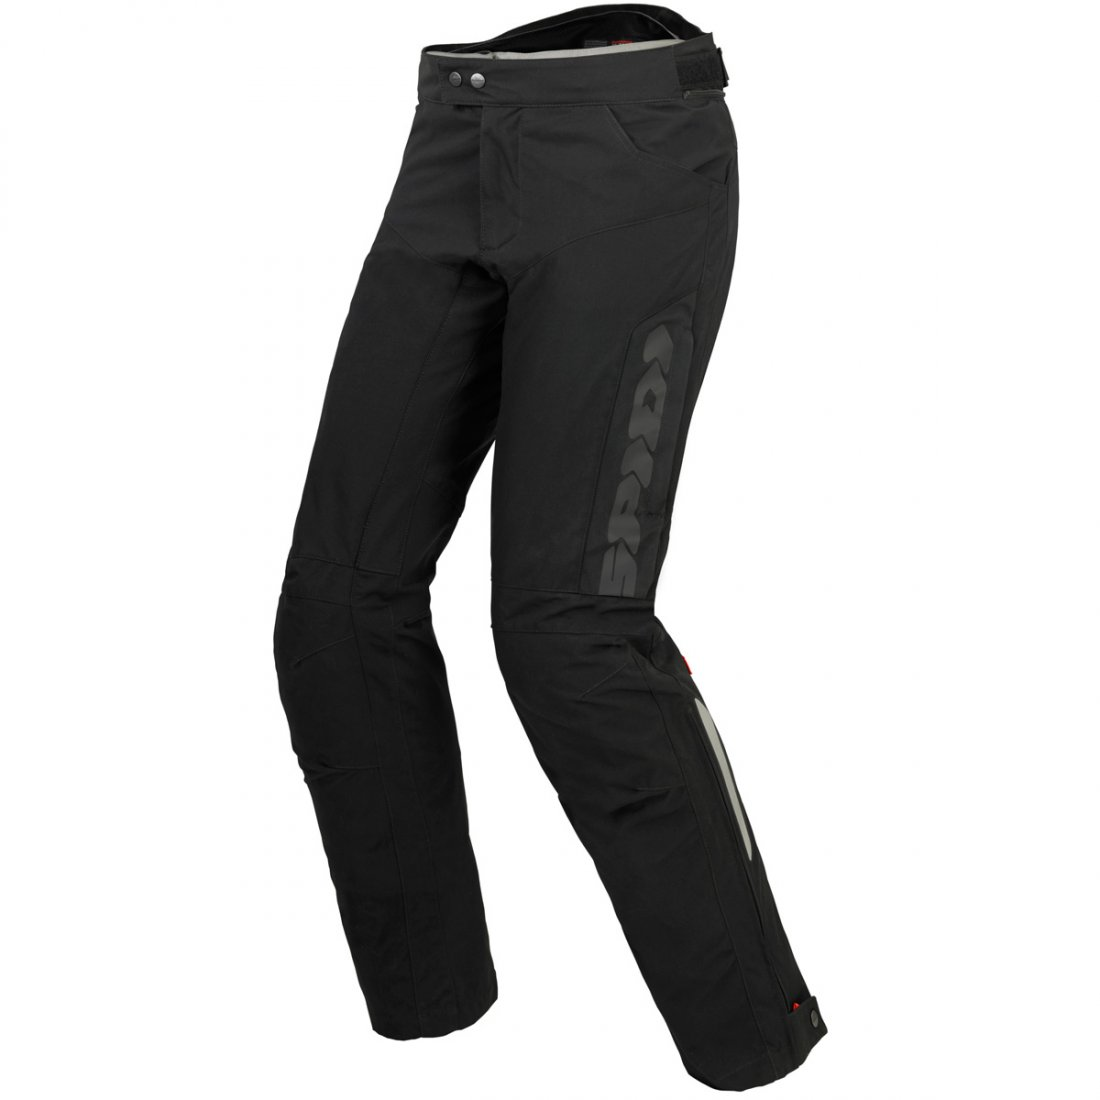 f6541b4d77 79 Pantalones para moto de carretera SPIDI · Motocard